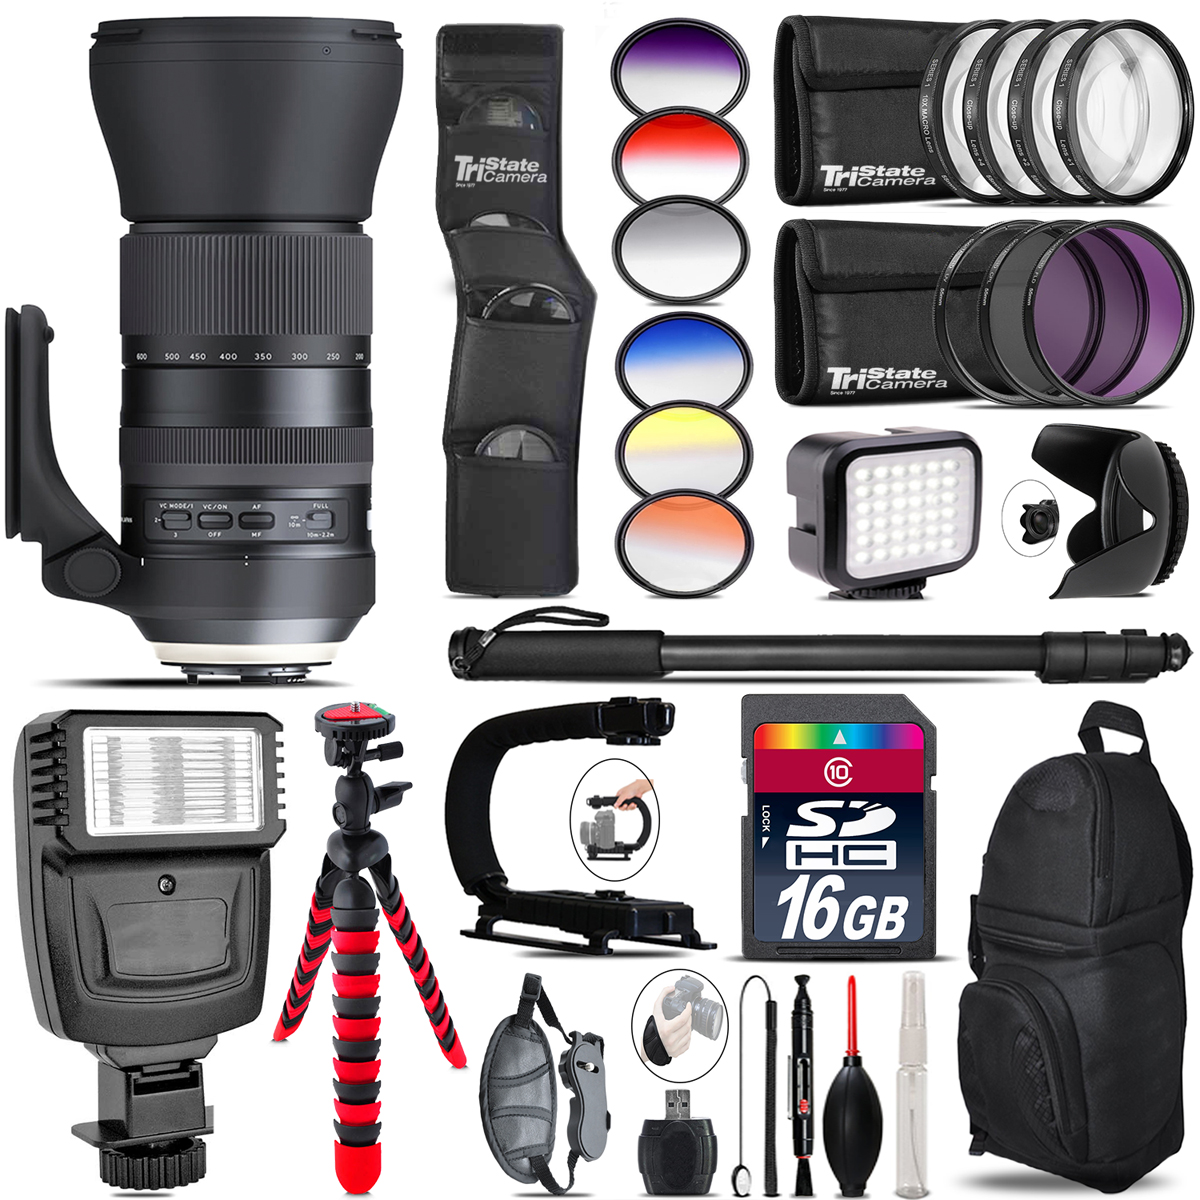 Tamron 150-600mm G2 for Nikon + Color Set + LED Light - 16GB Accessory Bundle *FREE SHIPPING*